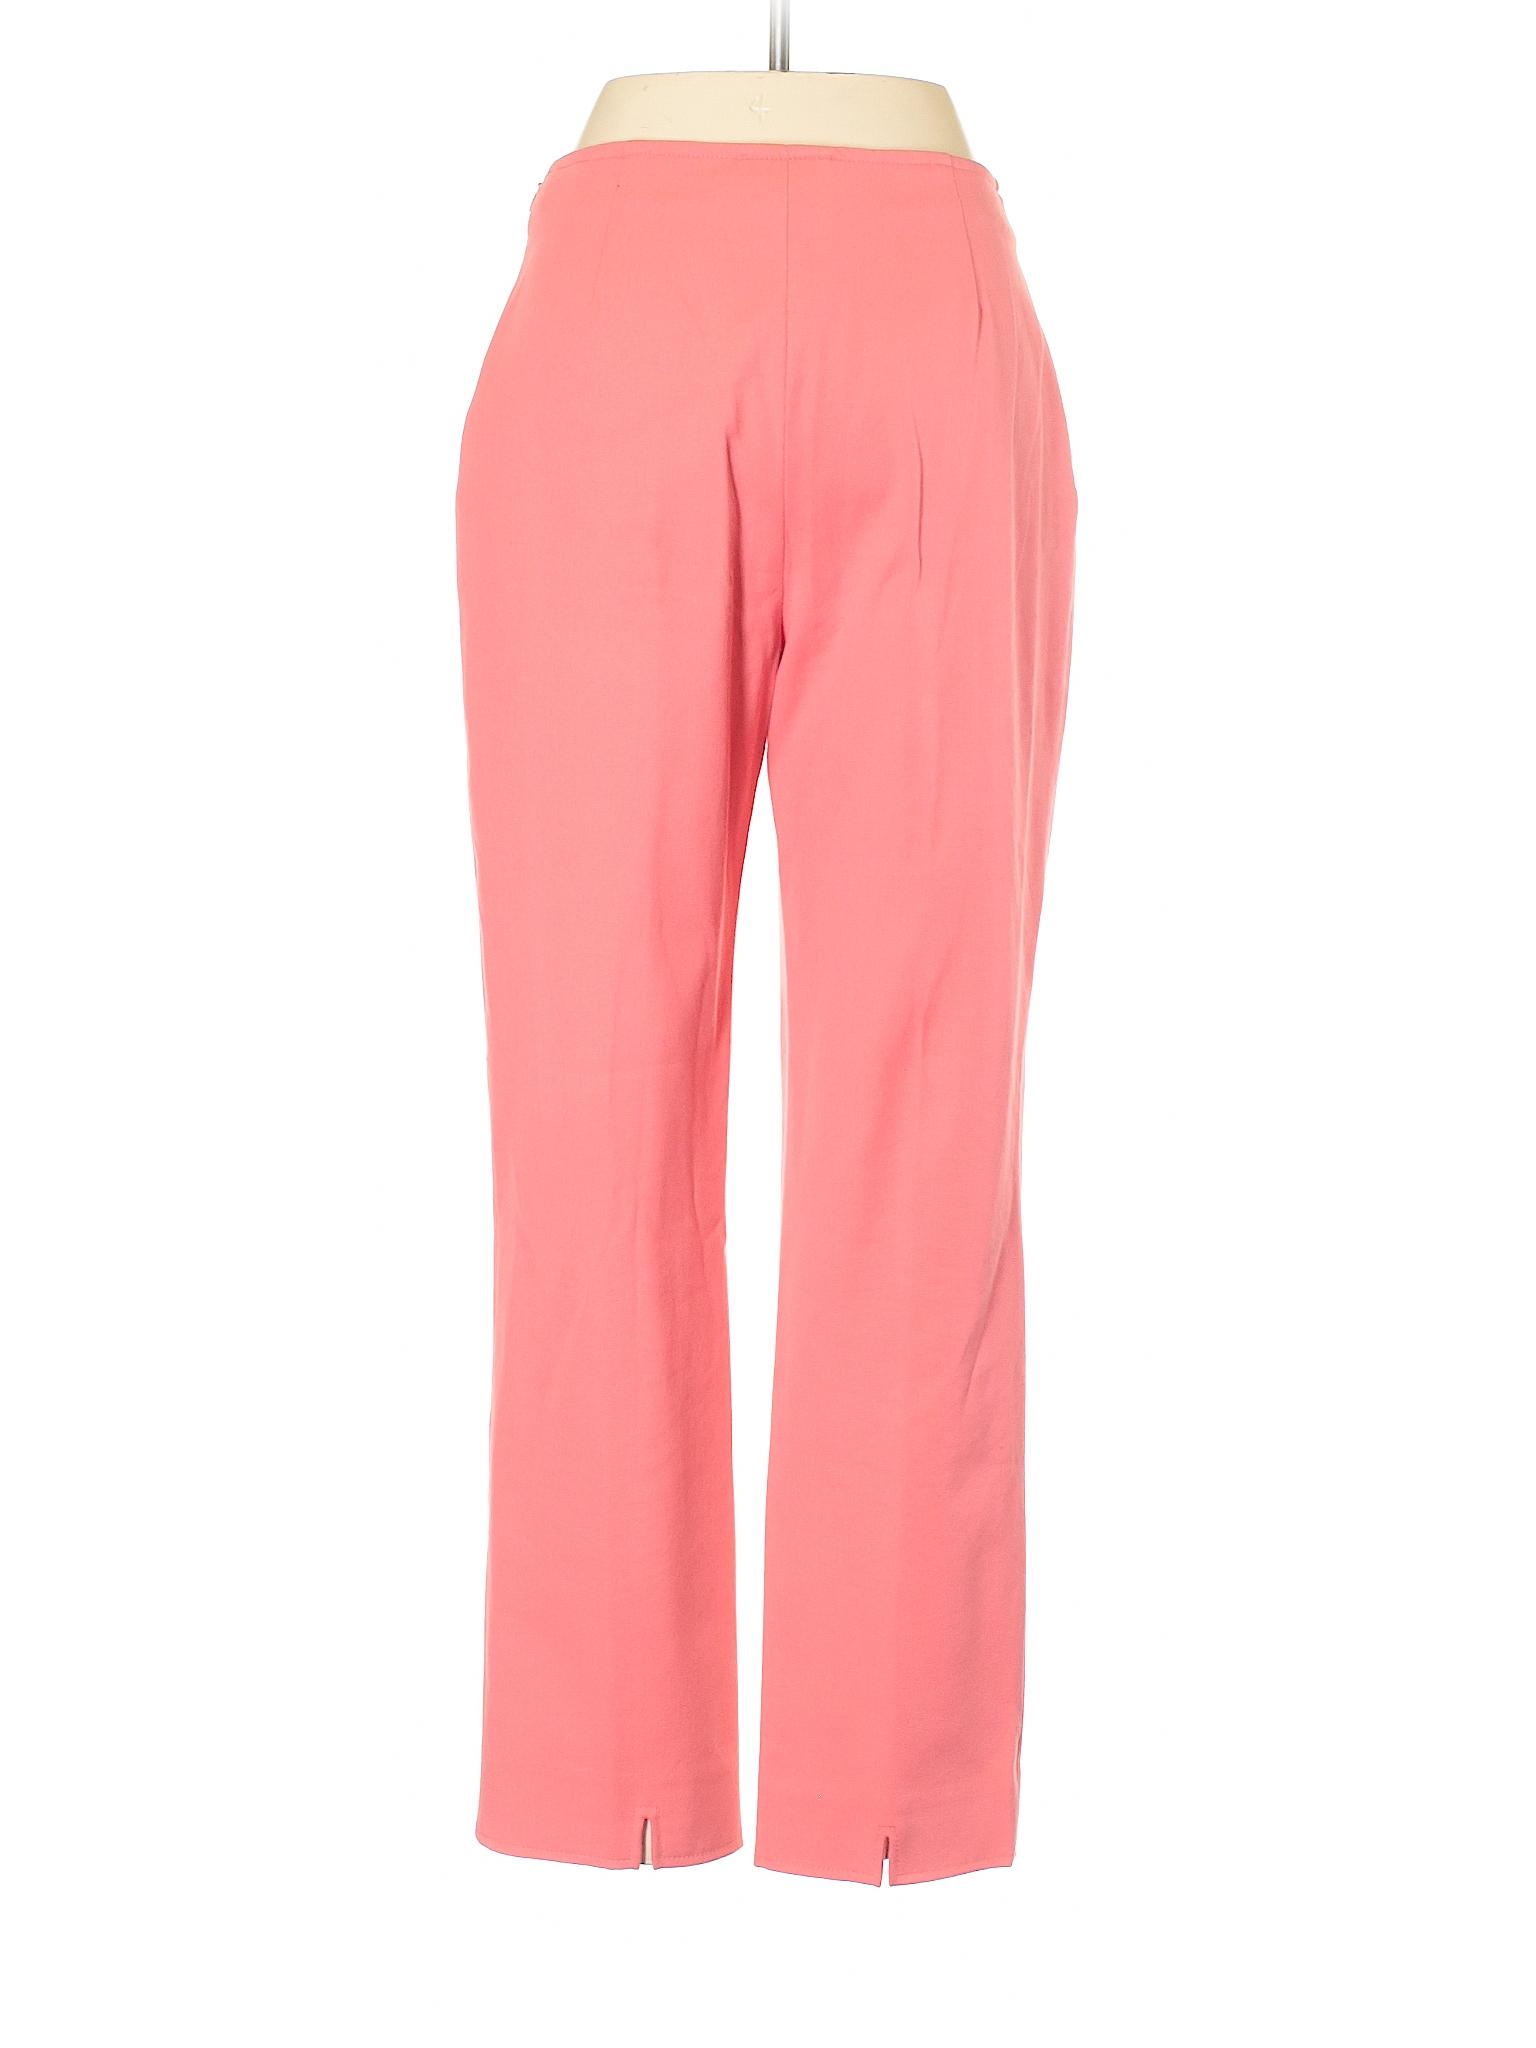 John St Boutique Dress Pants Sport xvP6BwqU